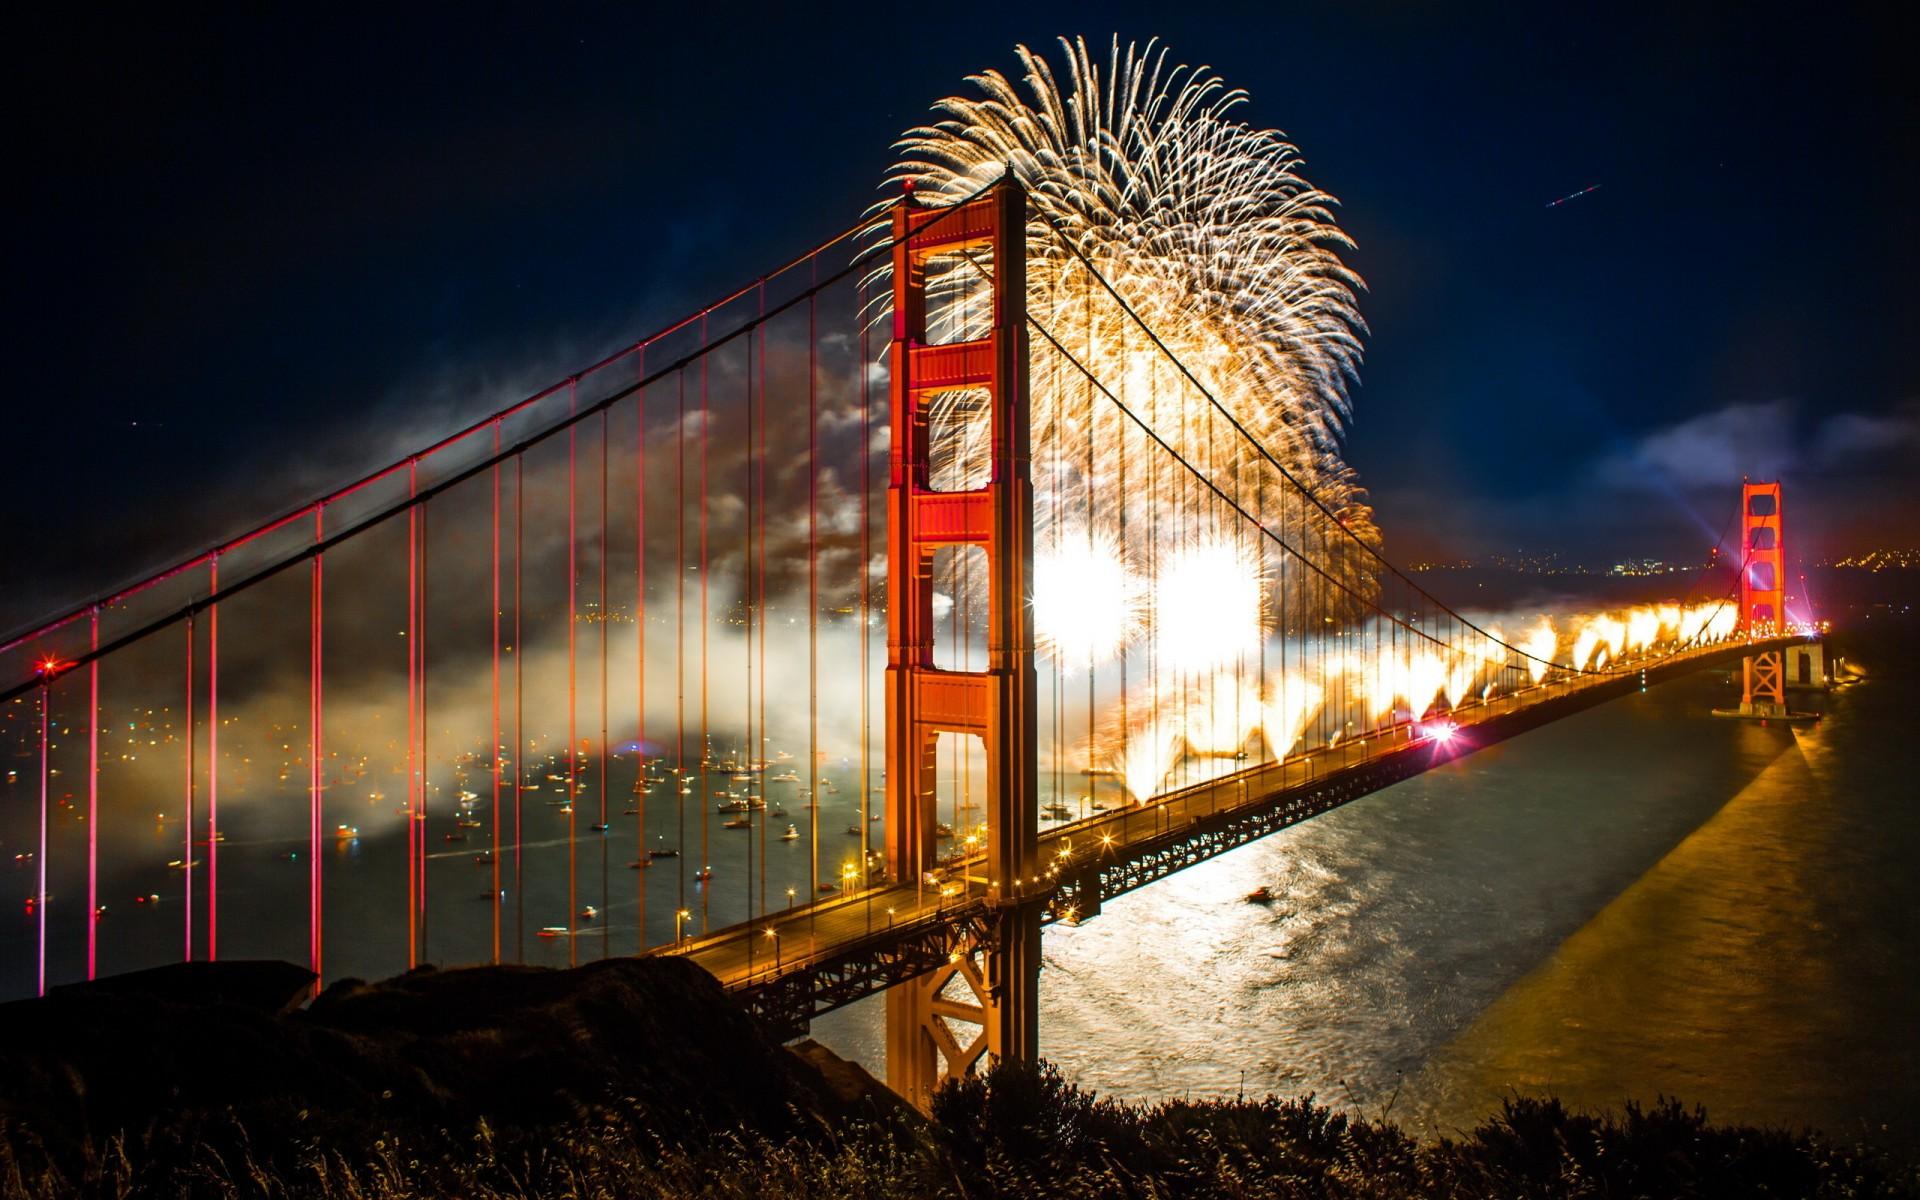 Night lights holiday - San Francisco Goldegate Bridge Architecture Night Lights Holidays July New Year Bay Boats Reflection Wallpaper 1920x1200 38070 Wallpaperup